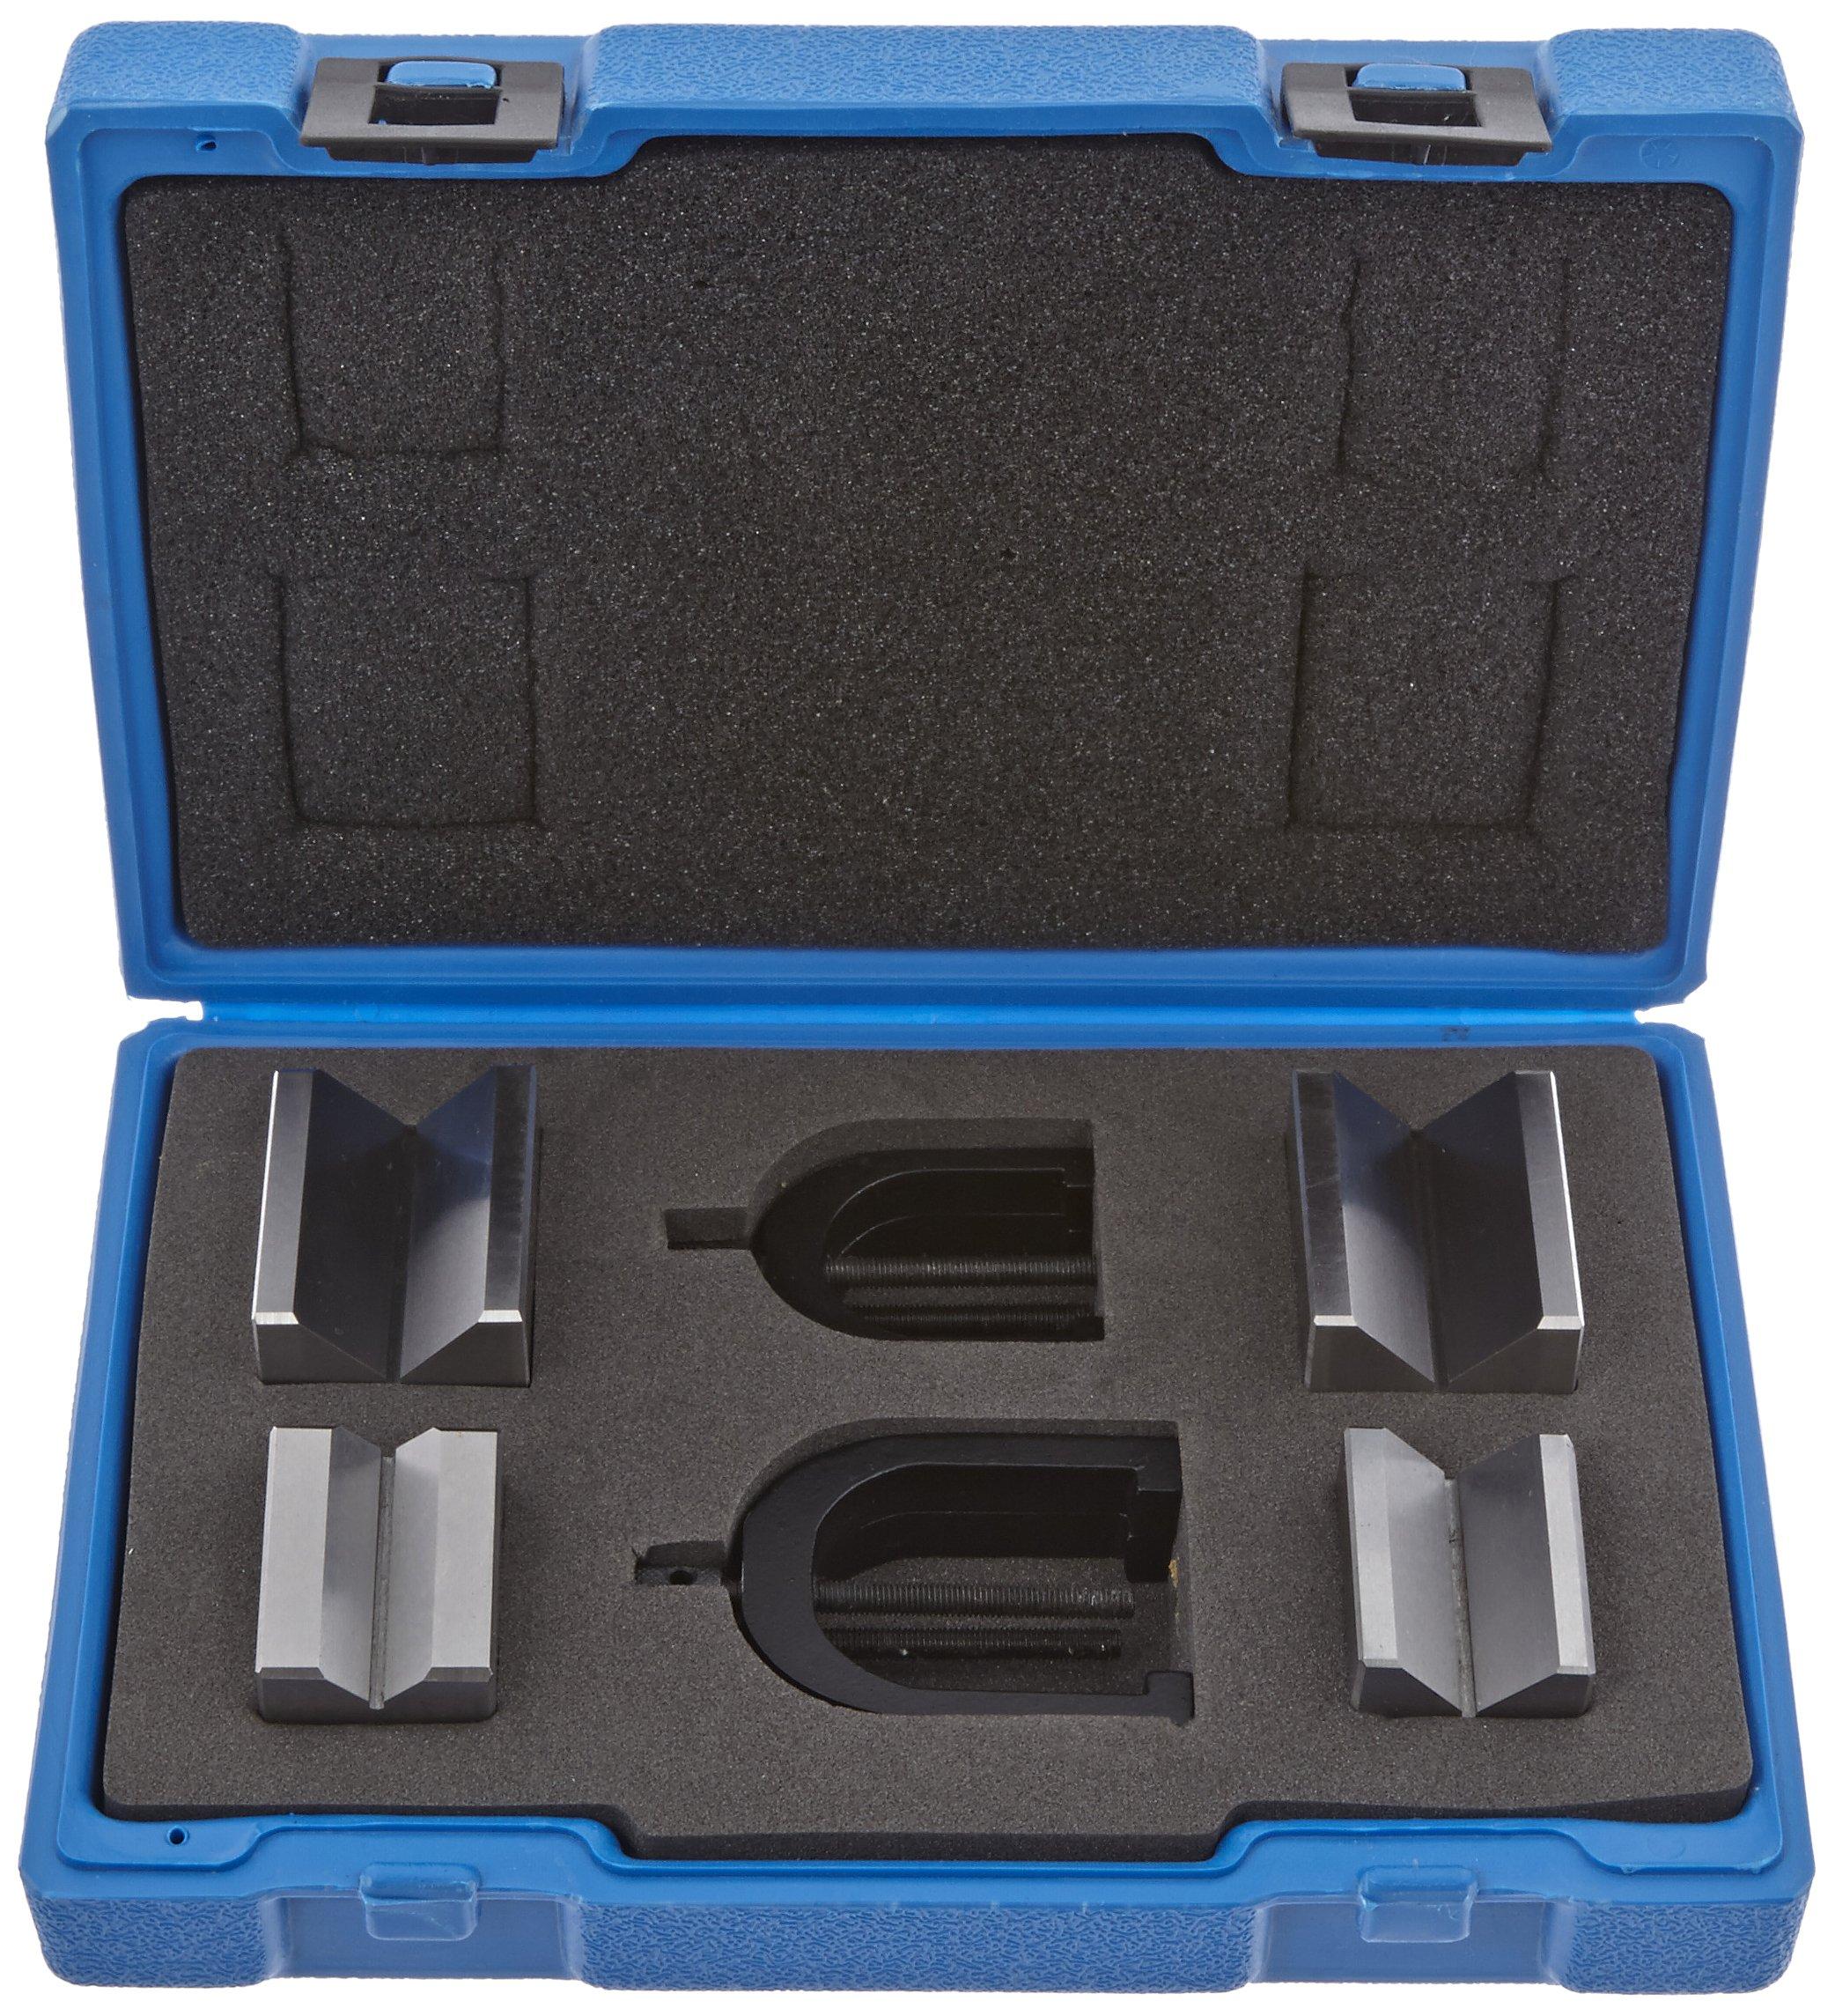 Fowler Full Warranty 52-475-500-0 Hardened Steel X-Blox V-Block Set, 1.5''L x 1.25''W x 1.25''H by Fowler